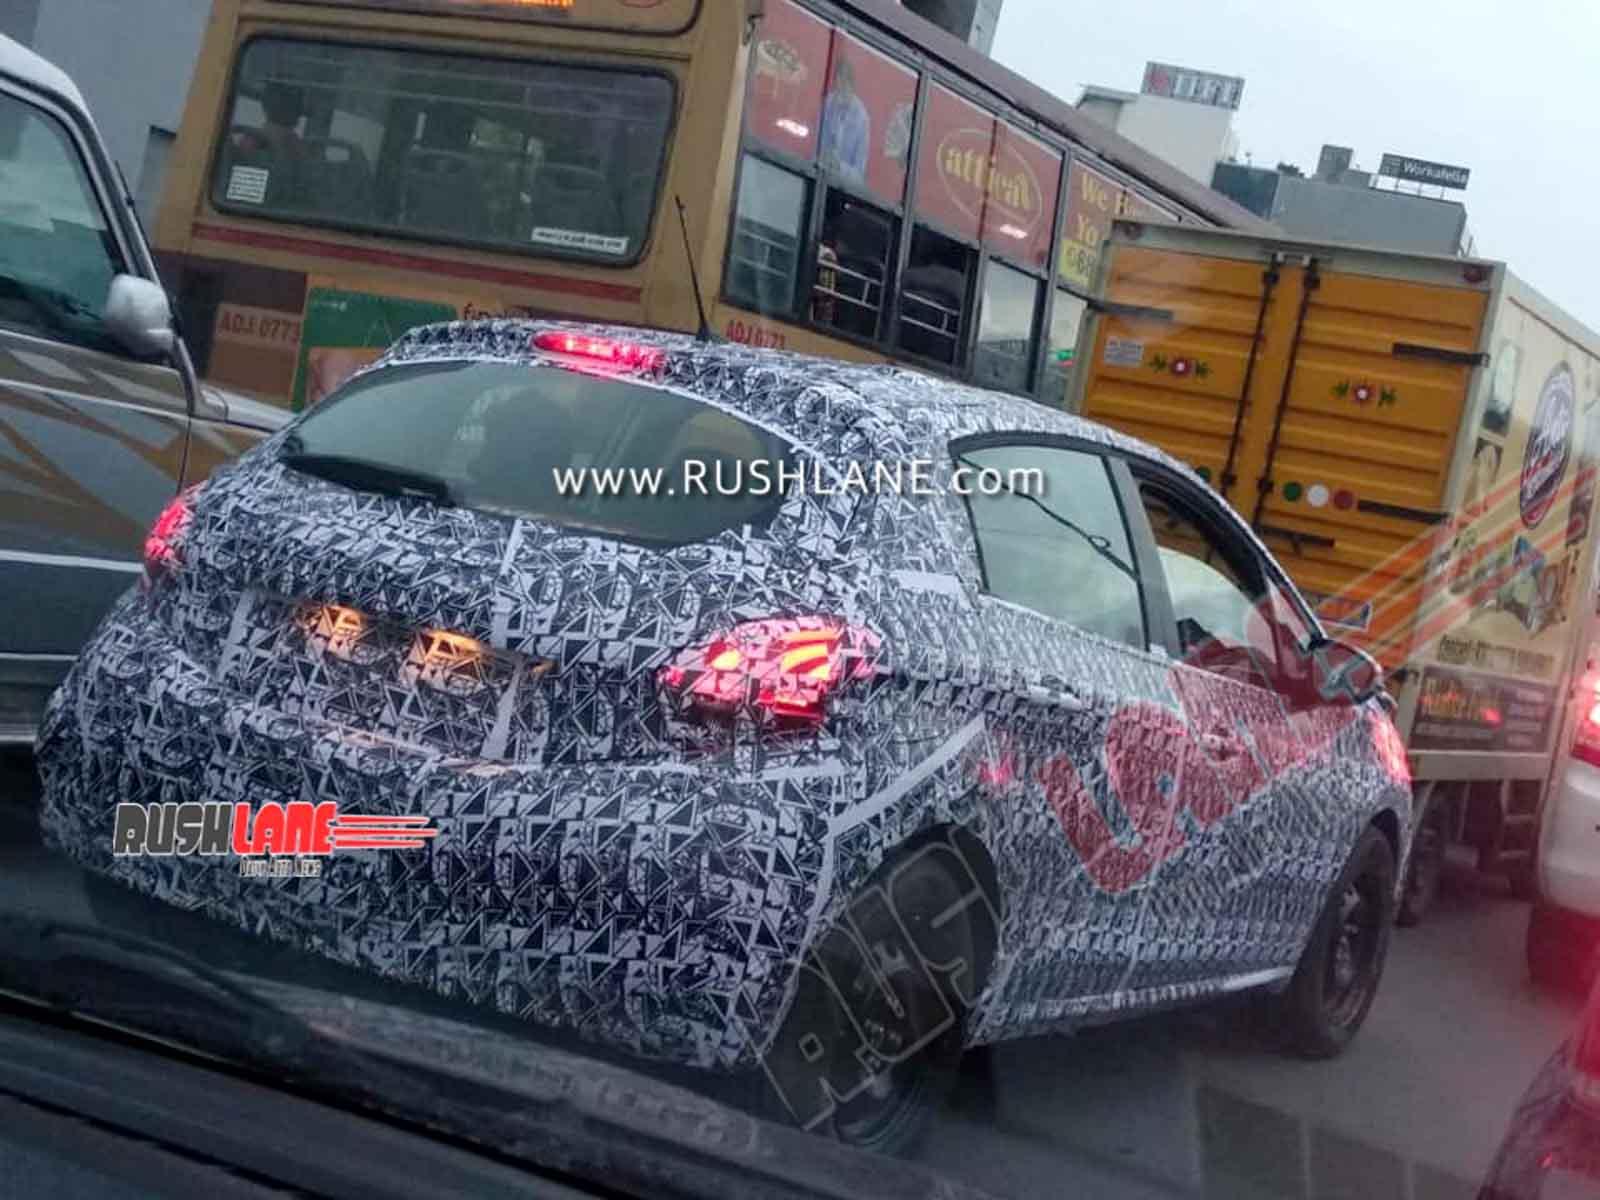 Peugeot 208 spied India